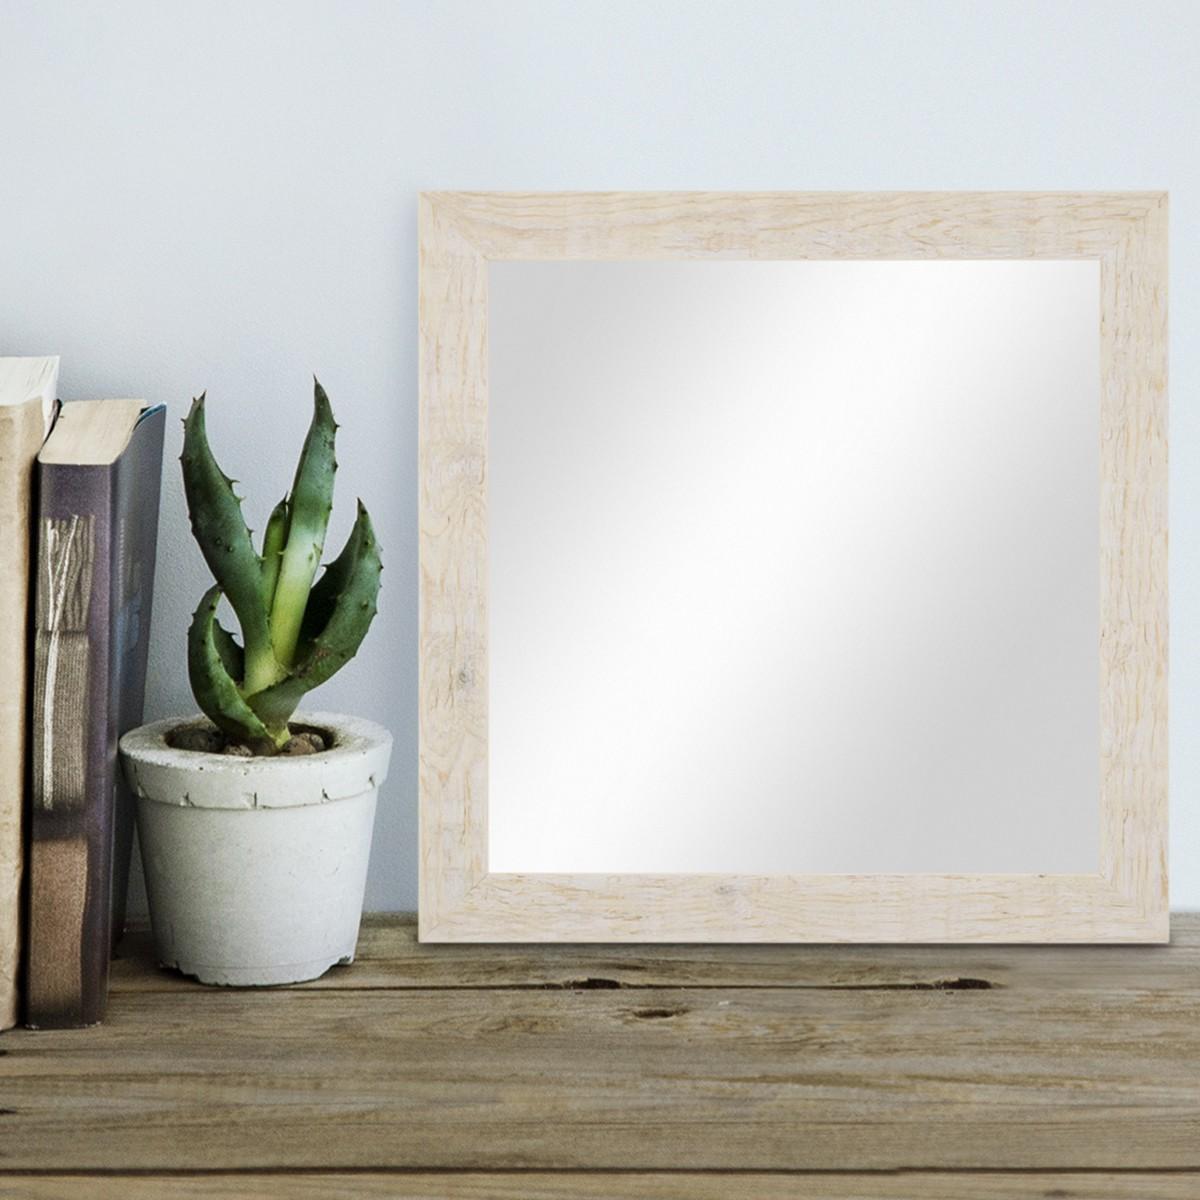 wand spiegel 36x36 cm im massivholz rahmen strandhaus stil rustikal weiss quadratisch. Black Bedroom Furniture Sets. Home Design Ideas